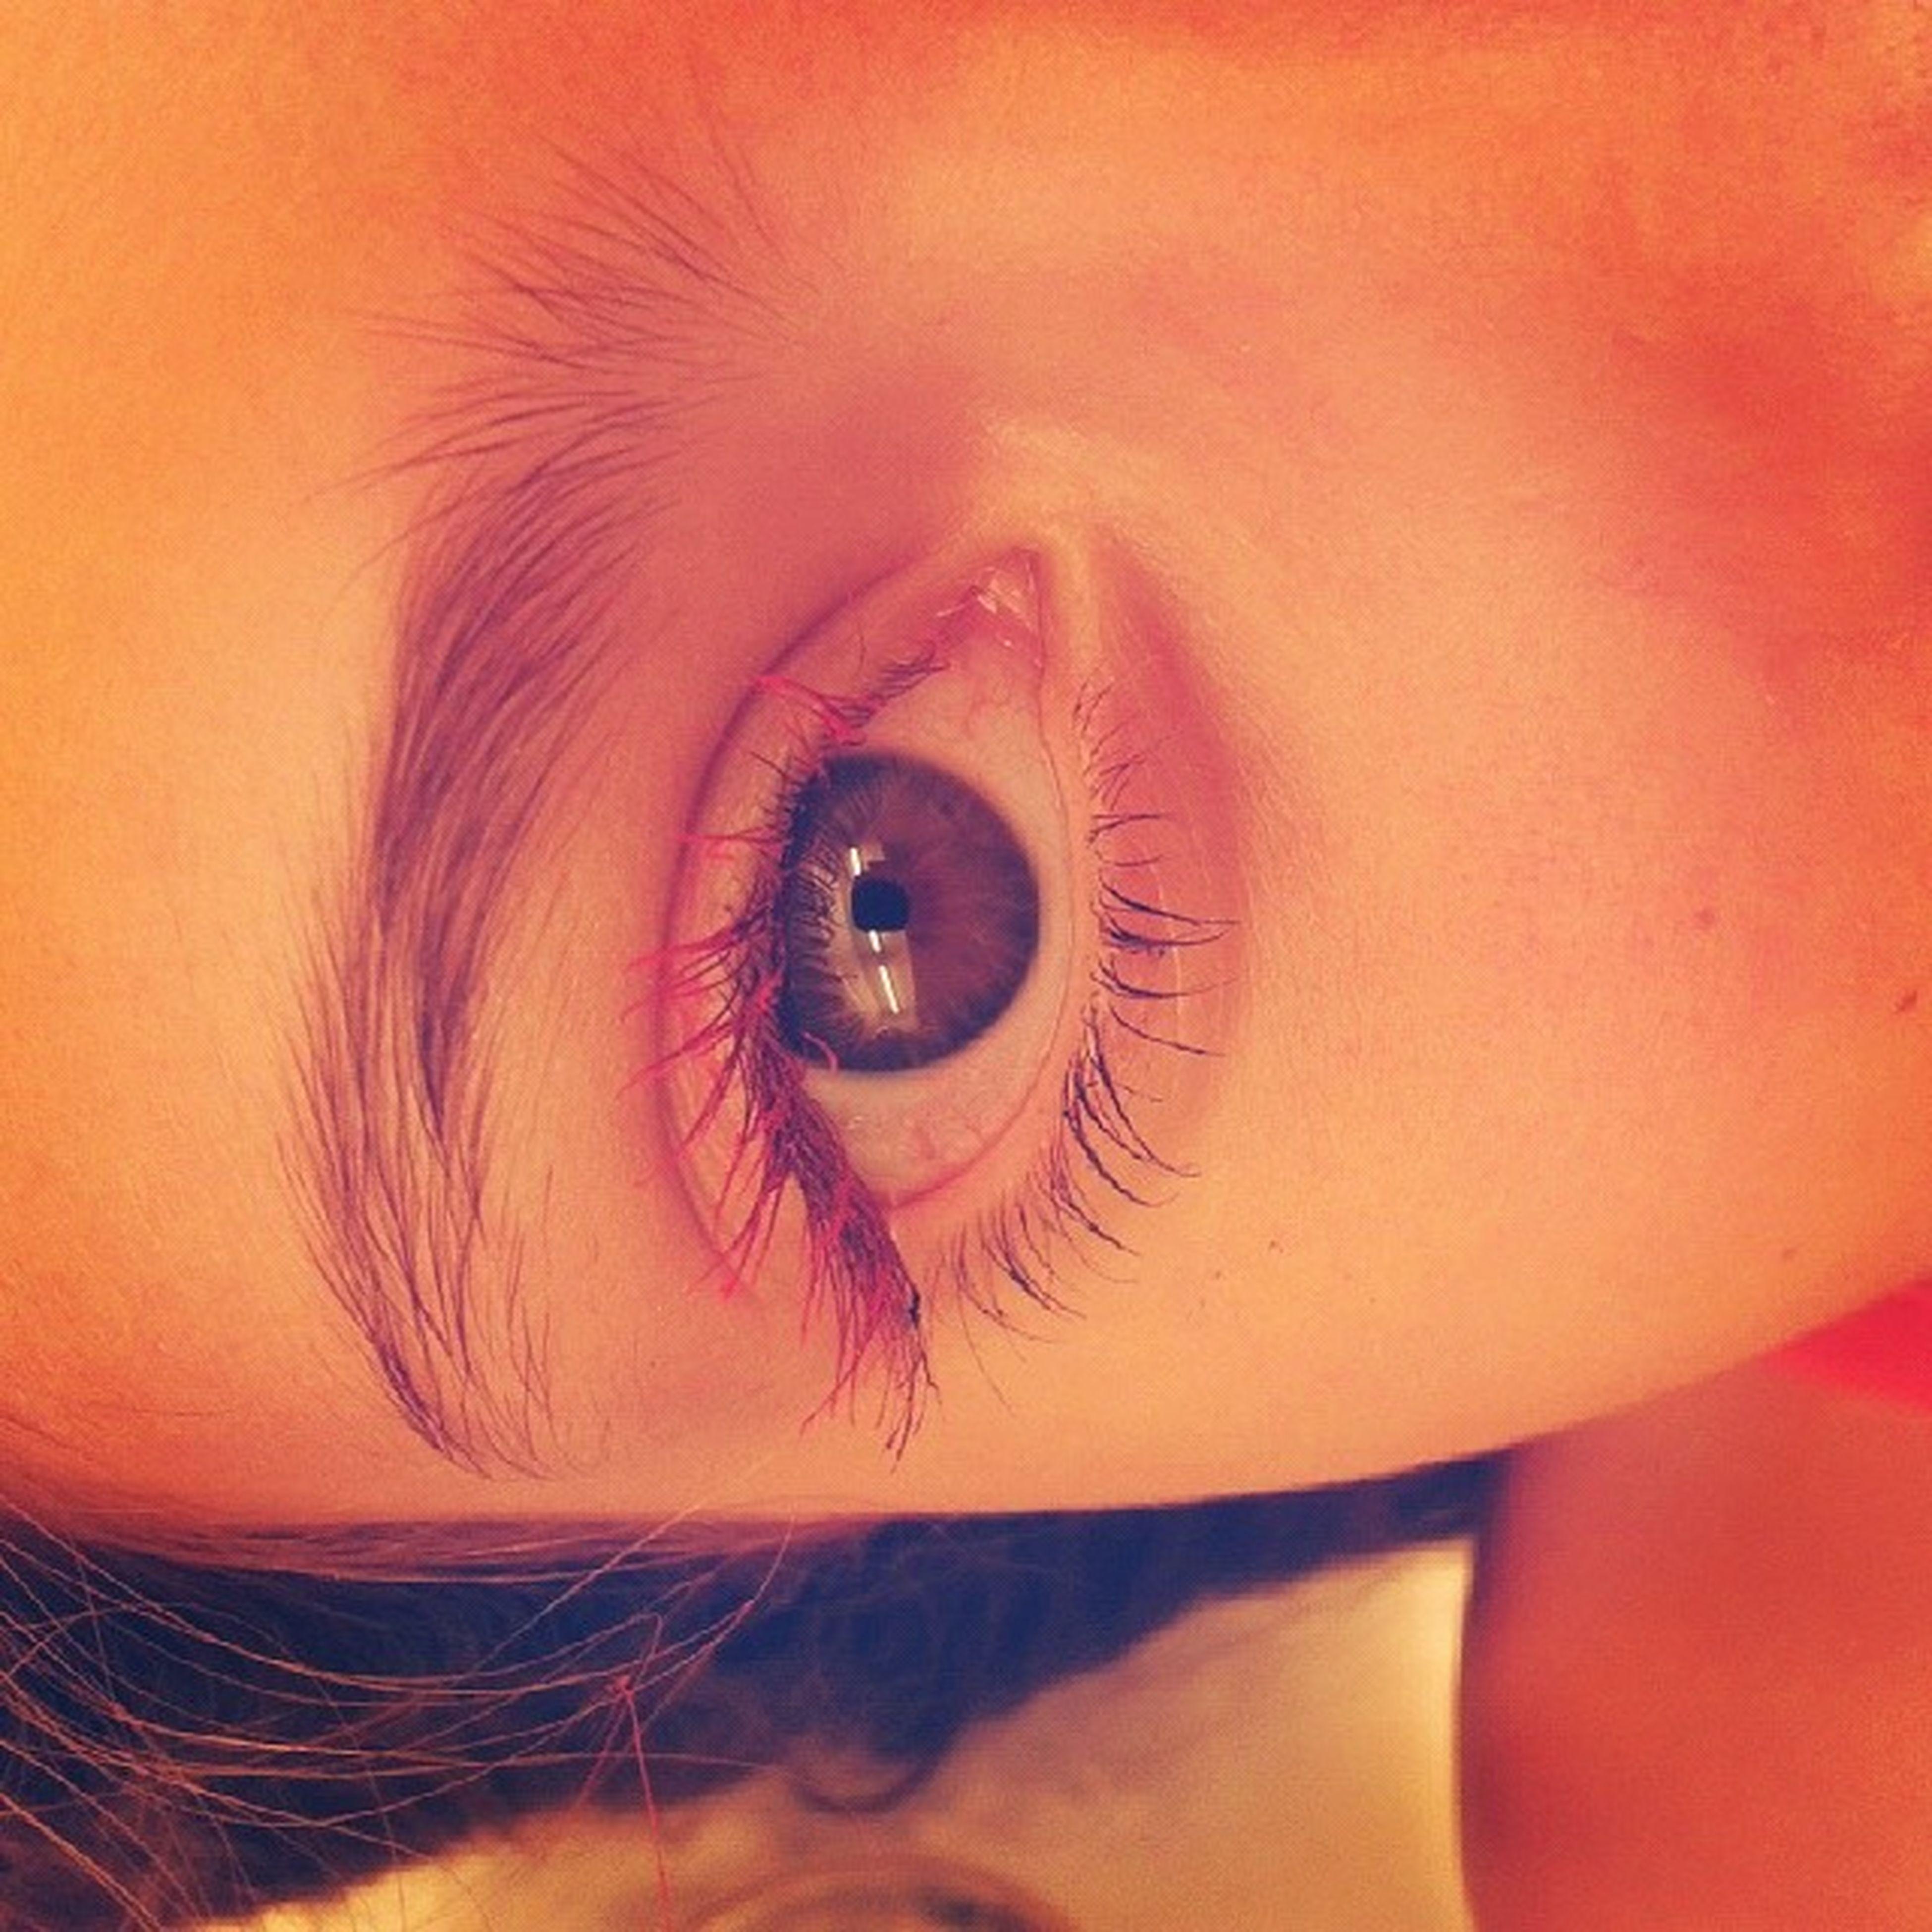 close-up, indoors, human eye, lifestyles, full frame, part of, backgrounds, looking at camera, portrait, leisure activity, headshot, eyelash, extreme close-up, eyesight, person, detail, orange color